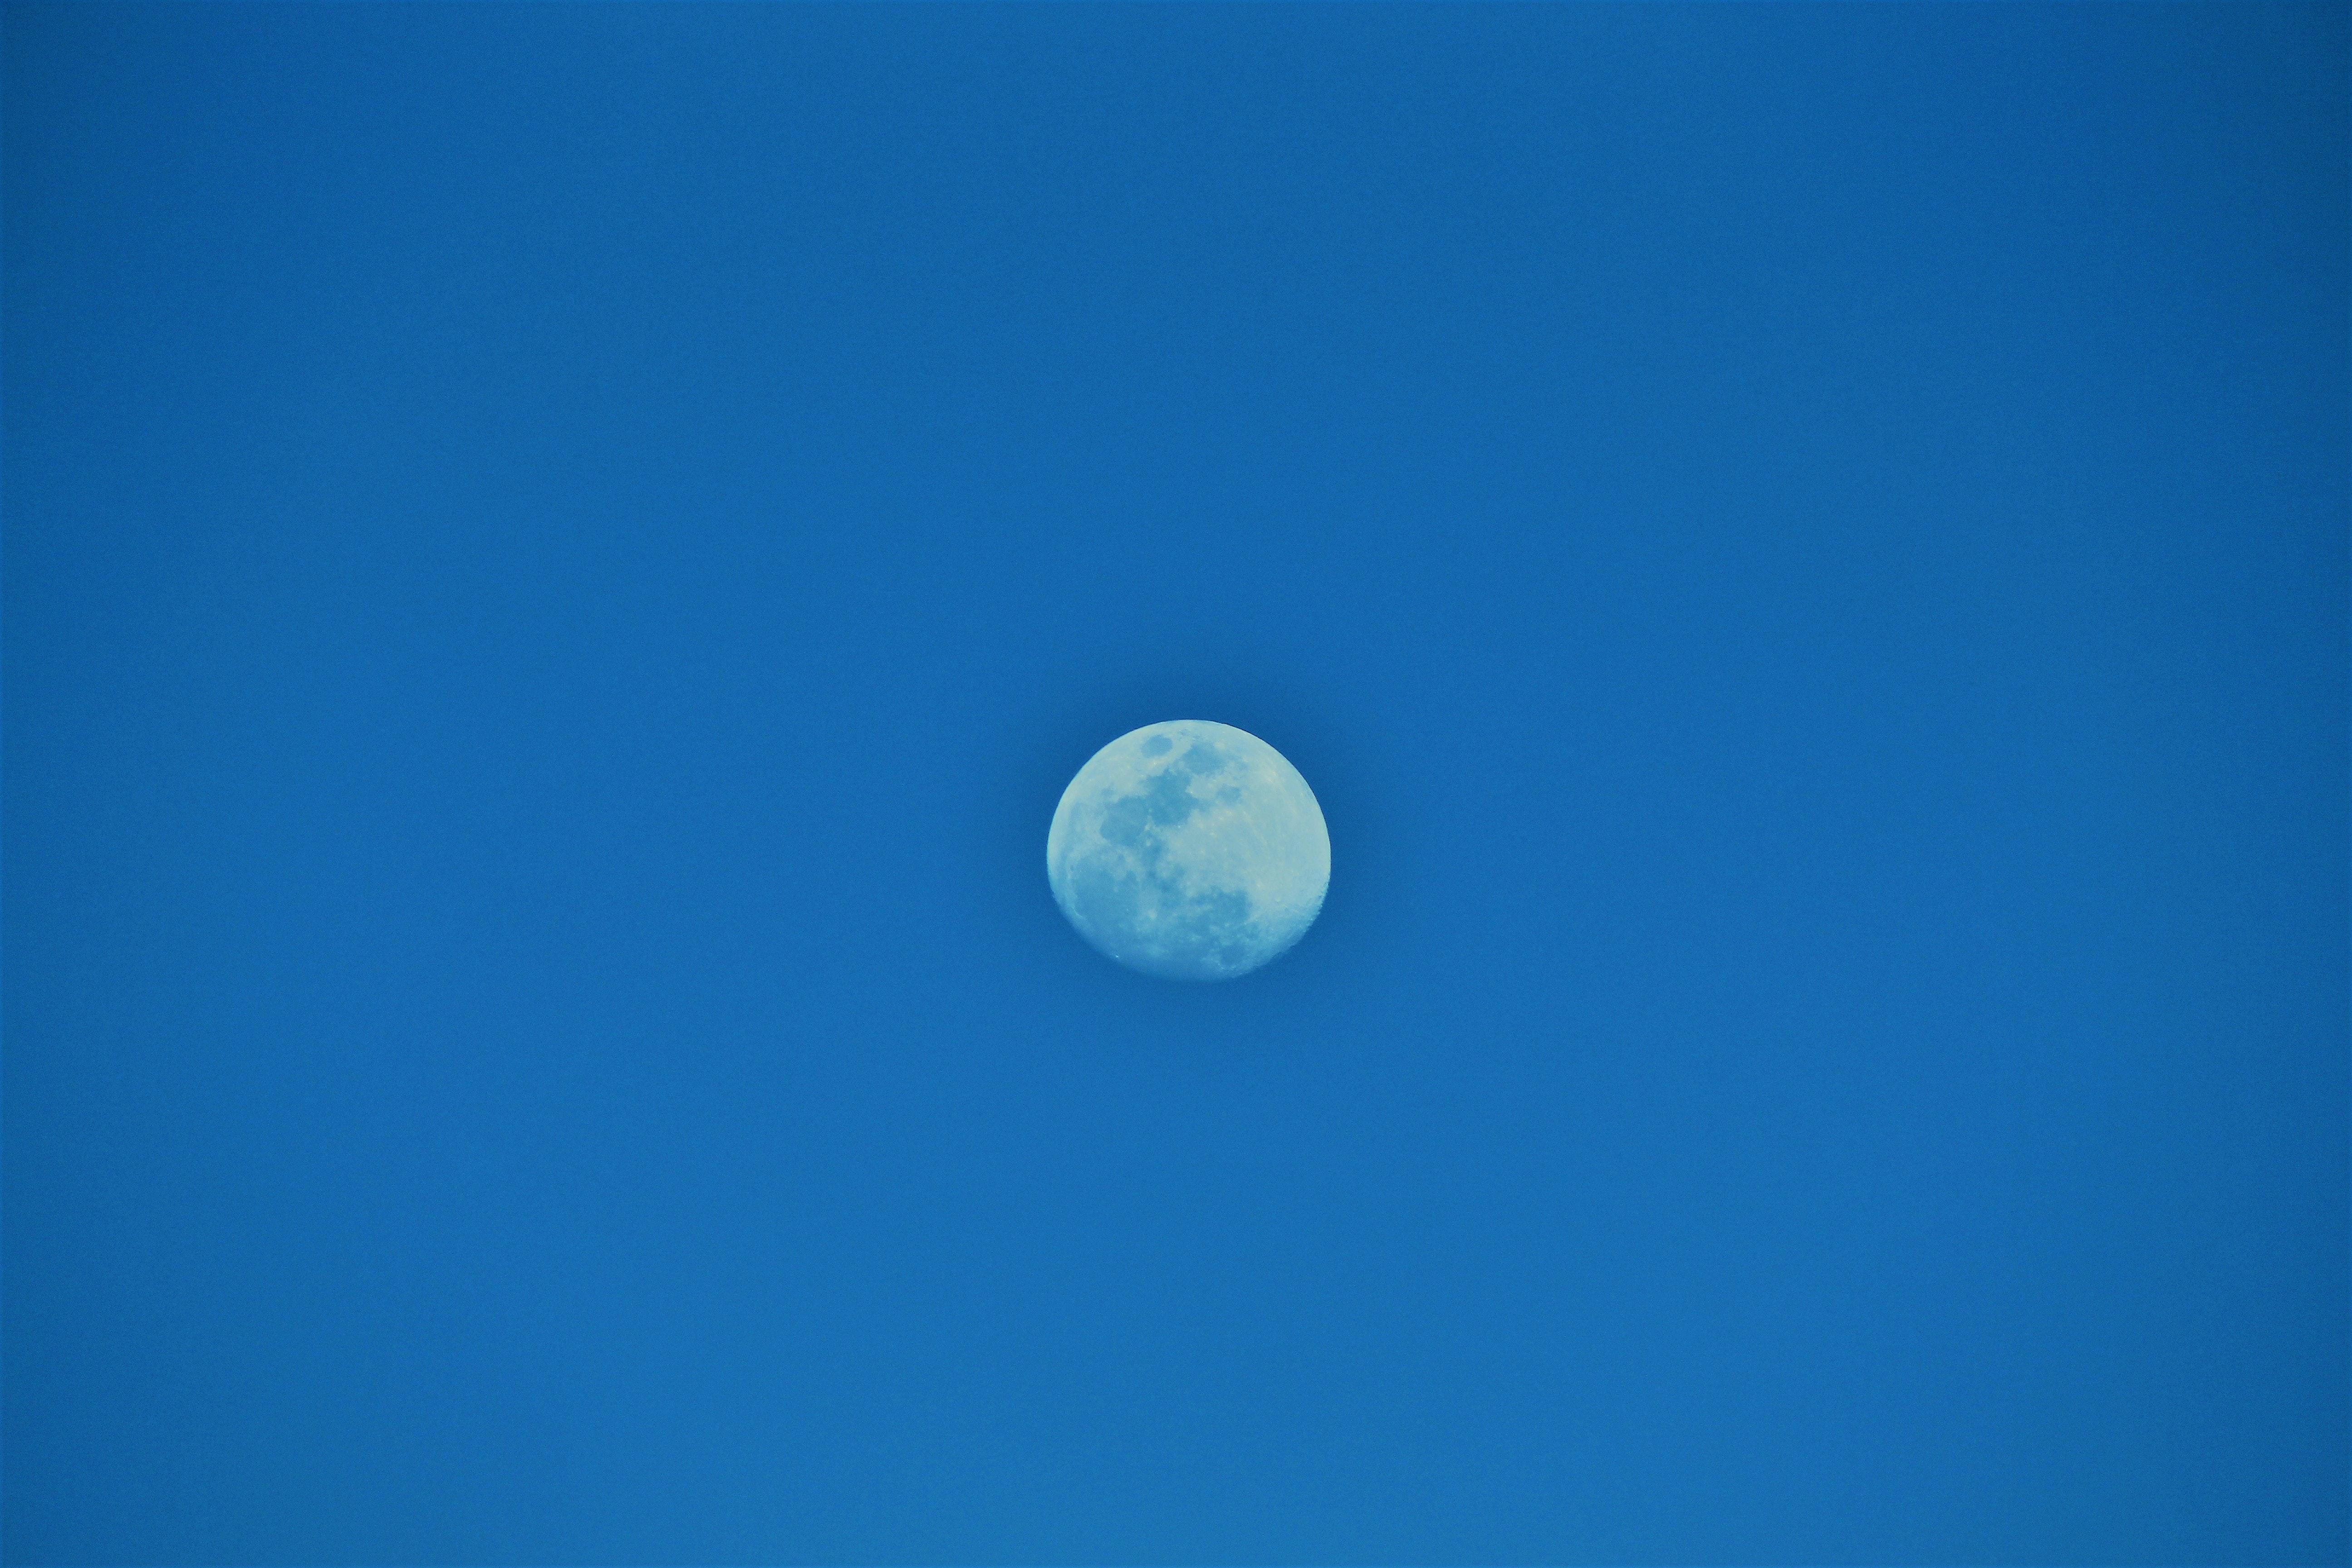 Free stock photo of blue moon, blue sky, moon